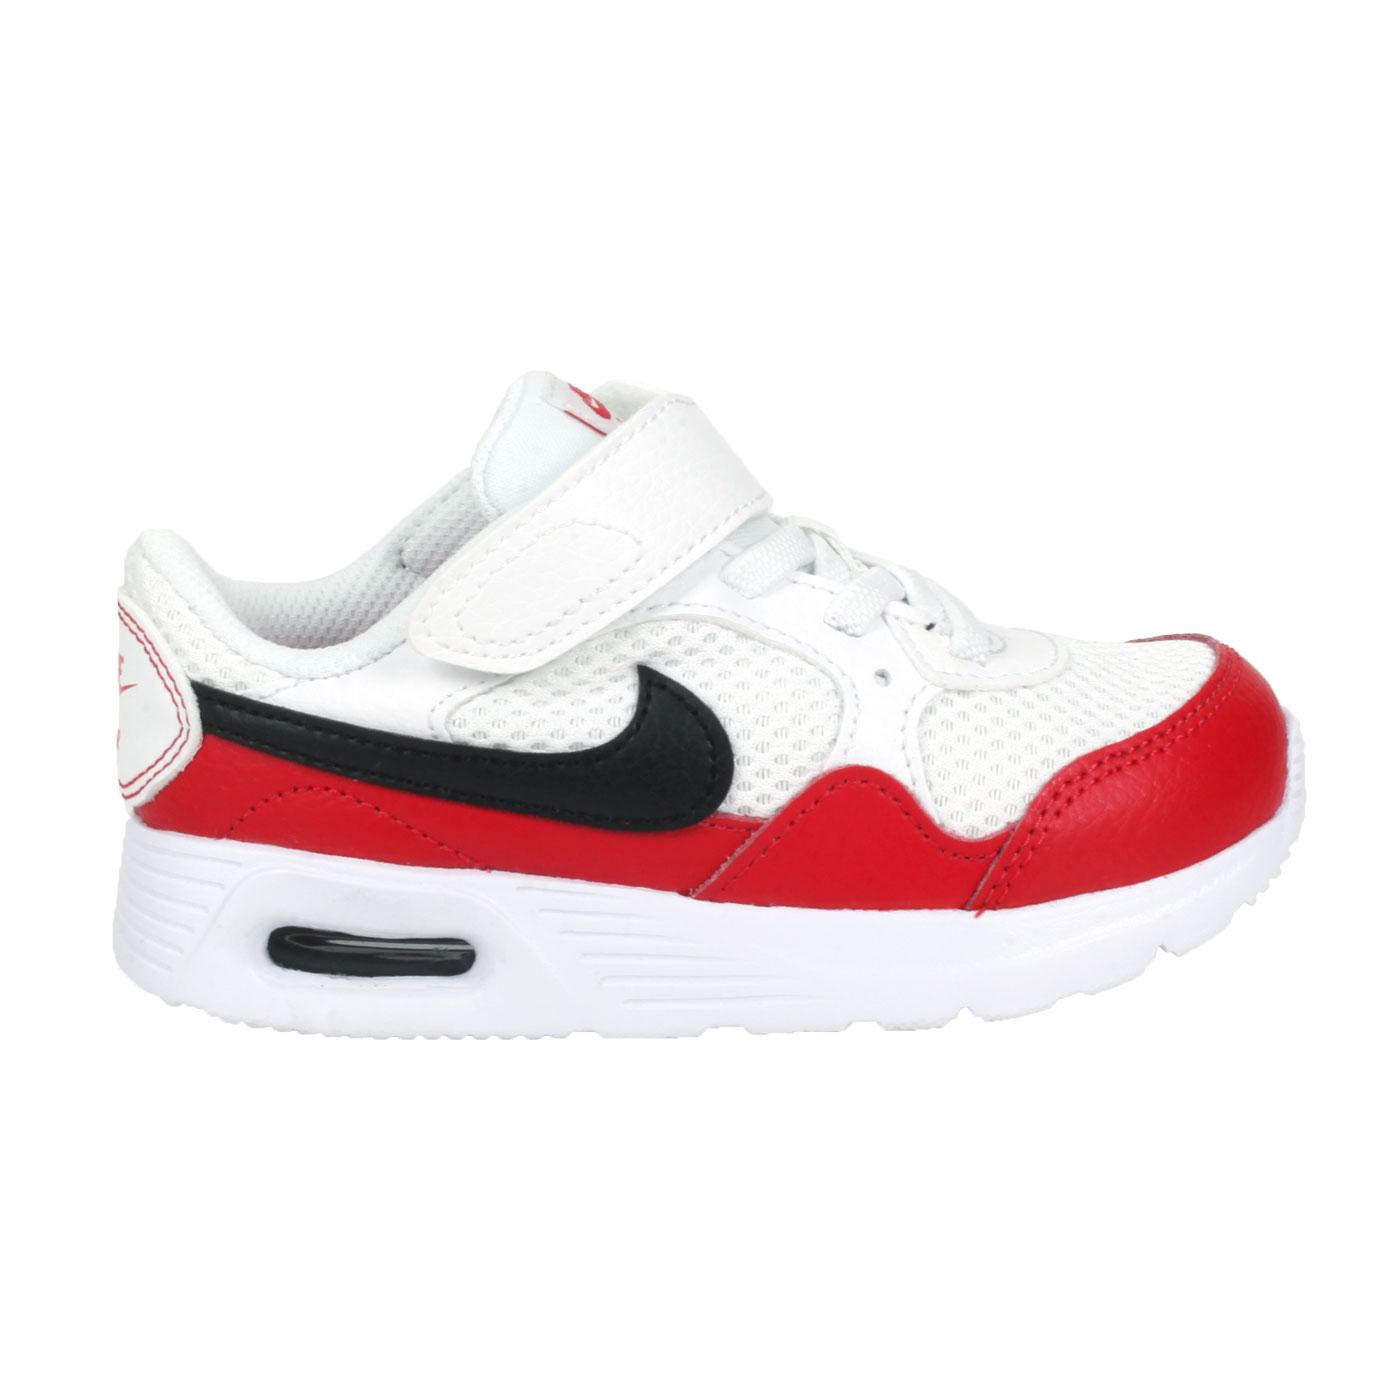 NIKE 小童休閒鞋  @AIR MAX SC(TDV)@CZ5361106 - 白紅黑